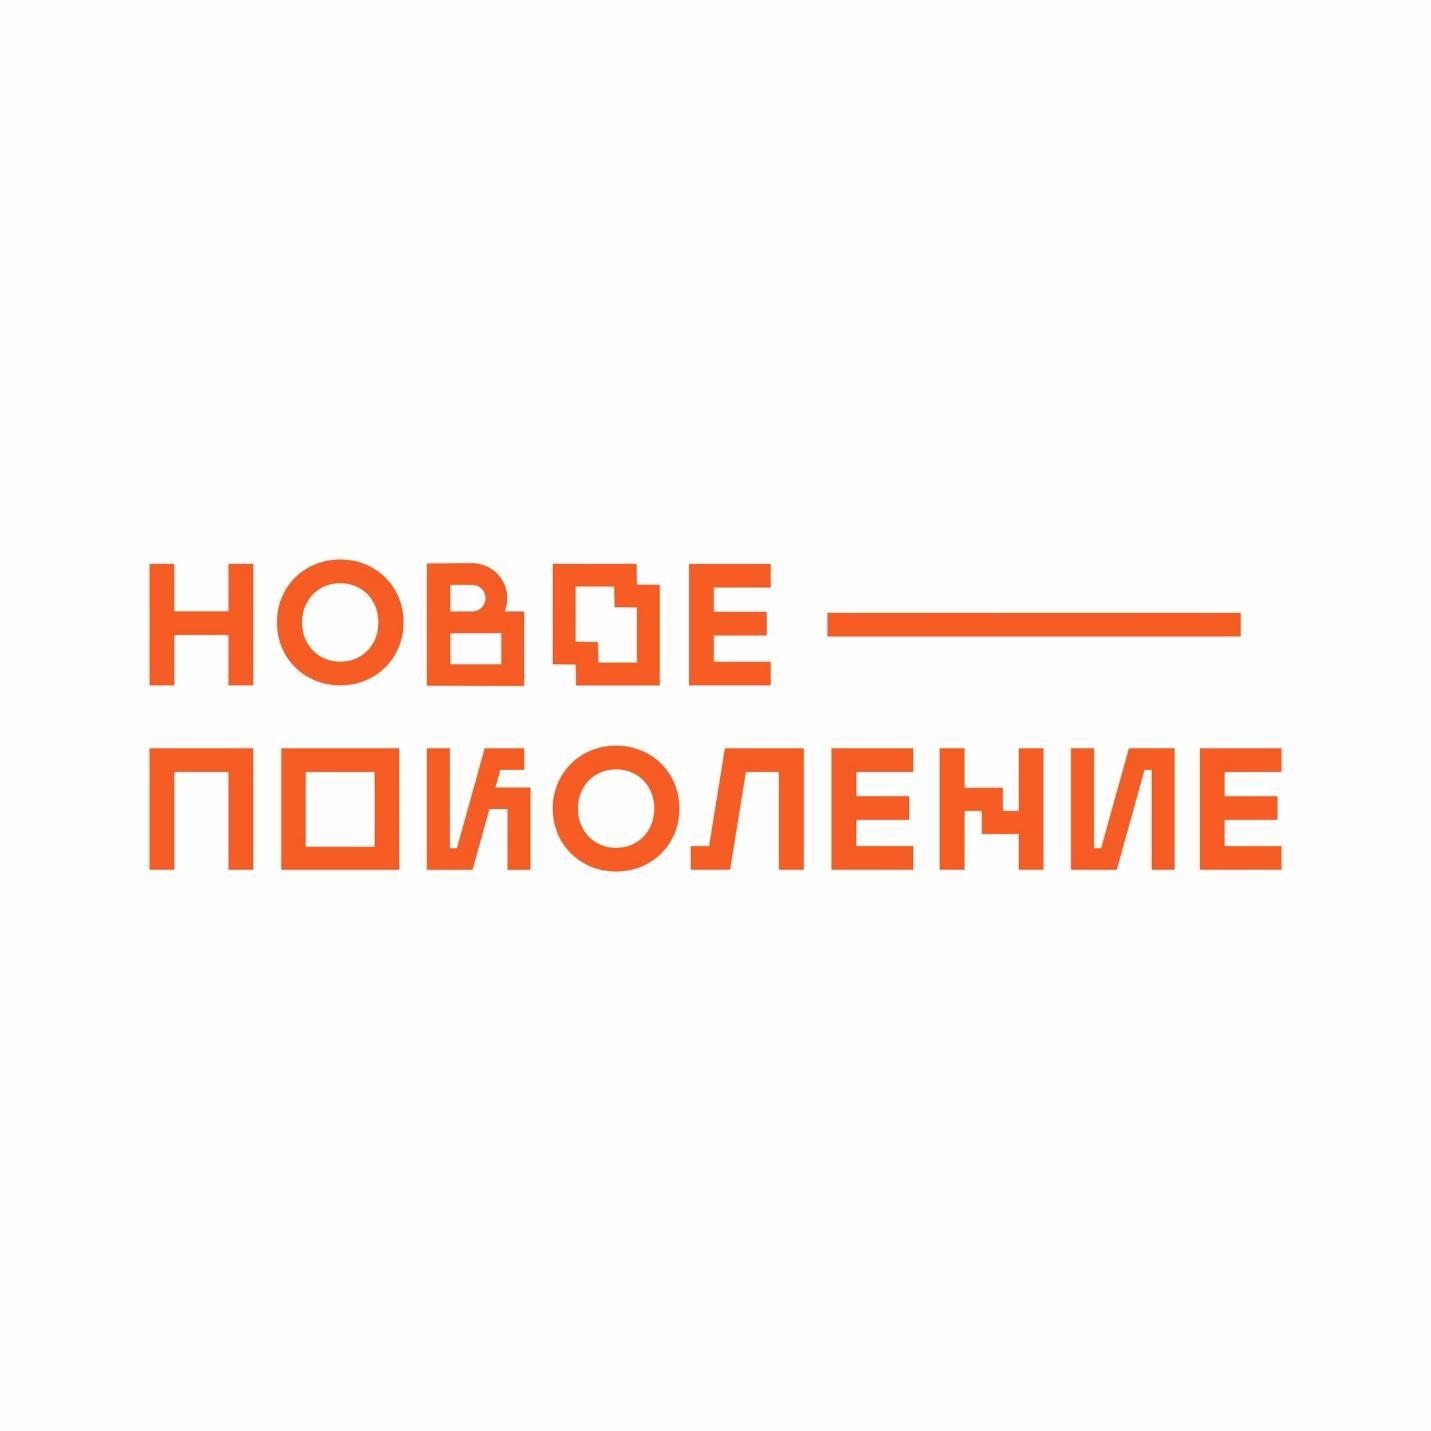 http://kd.utmn.ru/pluginfile.php/161/mod_forum/post/142/%D0%9D%D0%BE%D0%B2%D0%BE%D0%B5%20%D0%BF%D0%BE%D0%BA%D0%BE%D0%BB%D0%B5%D0%BD%D0%B8%D0%B5.jpg